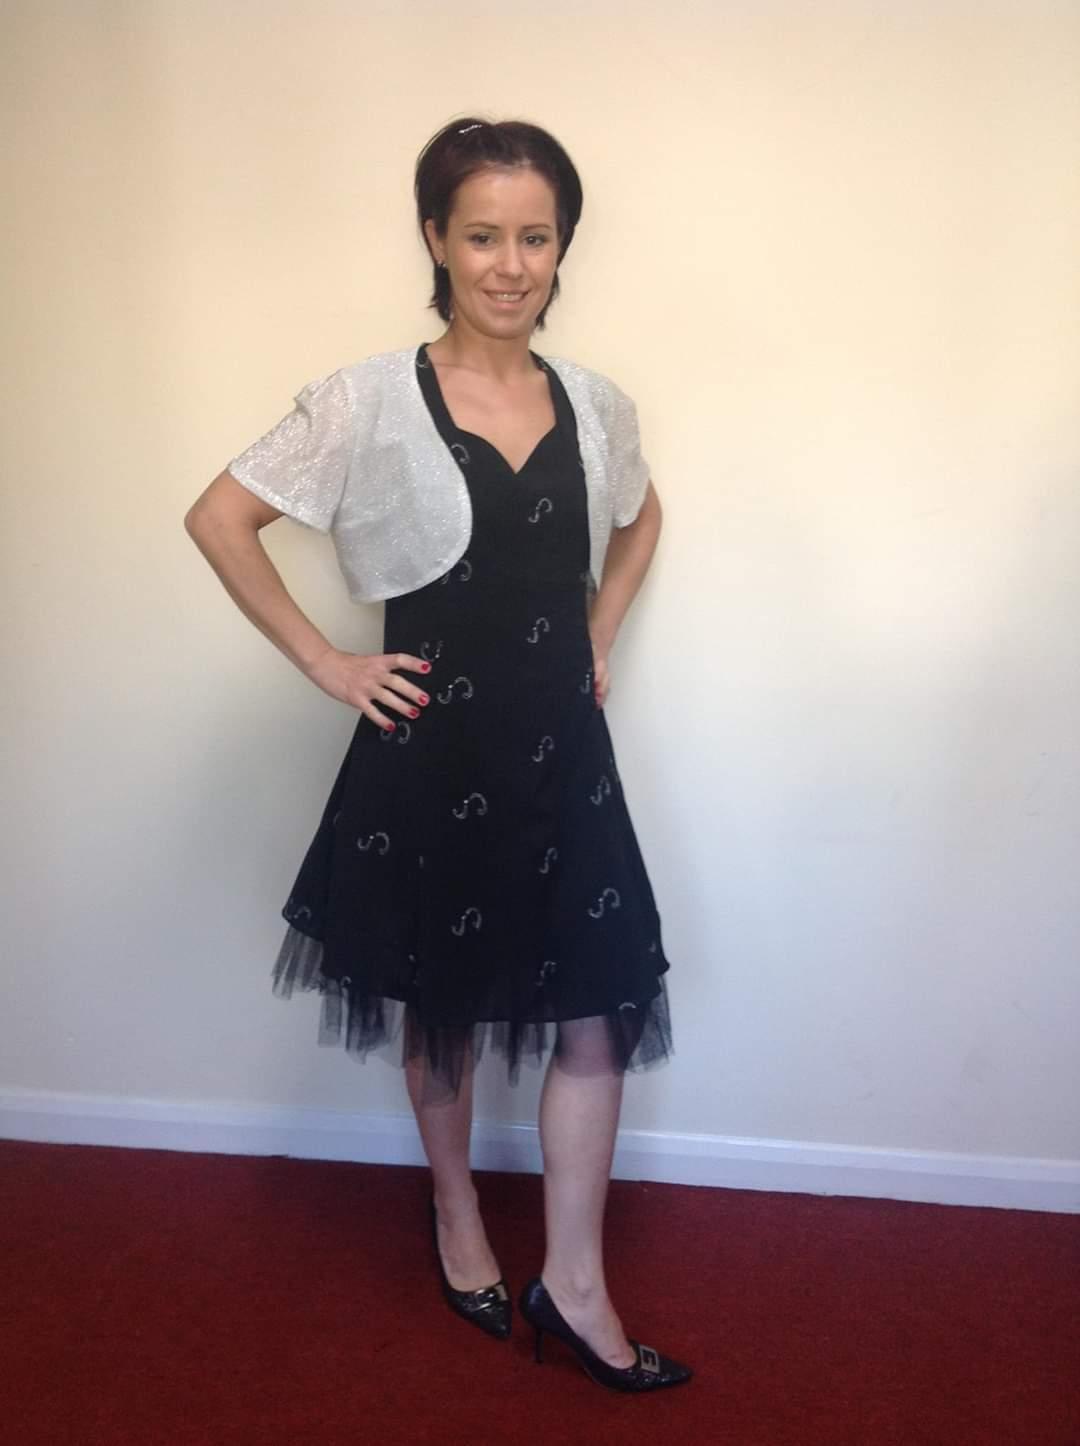 dressmaking and design services wimbledon